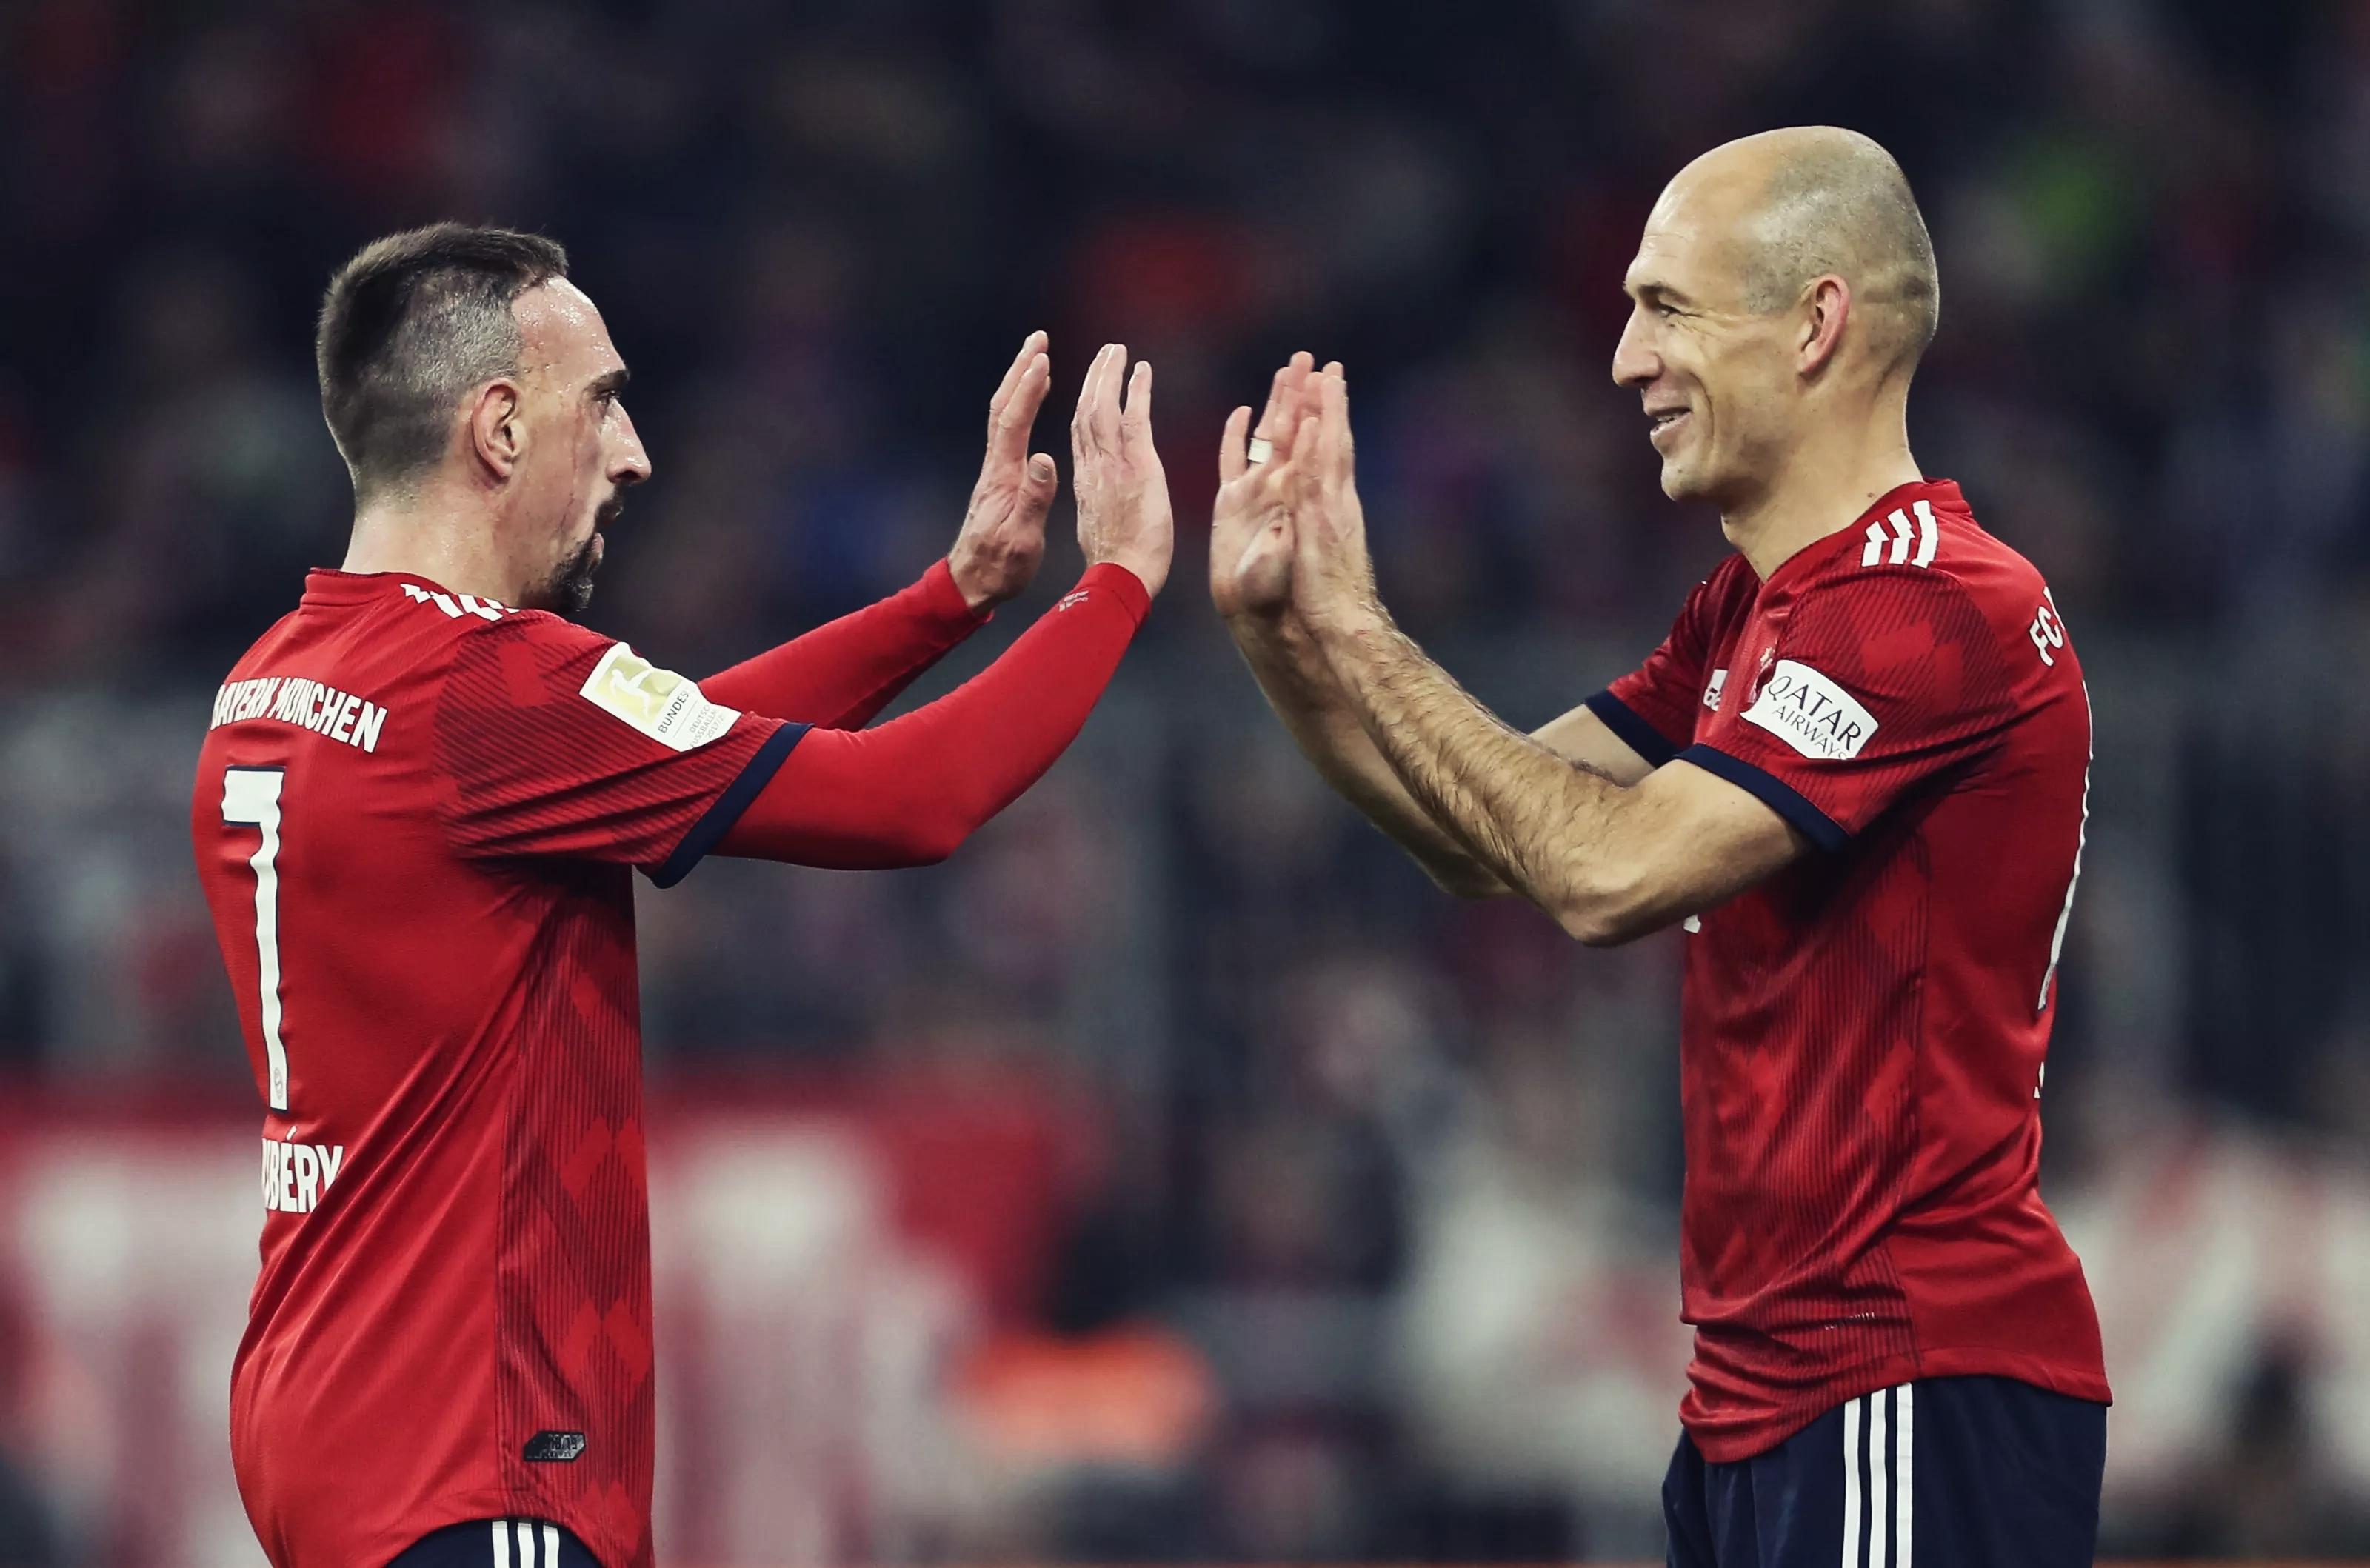 Le Bayern Munich rend hommage à Ribéry, Robben et Rafinha